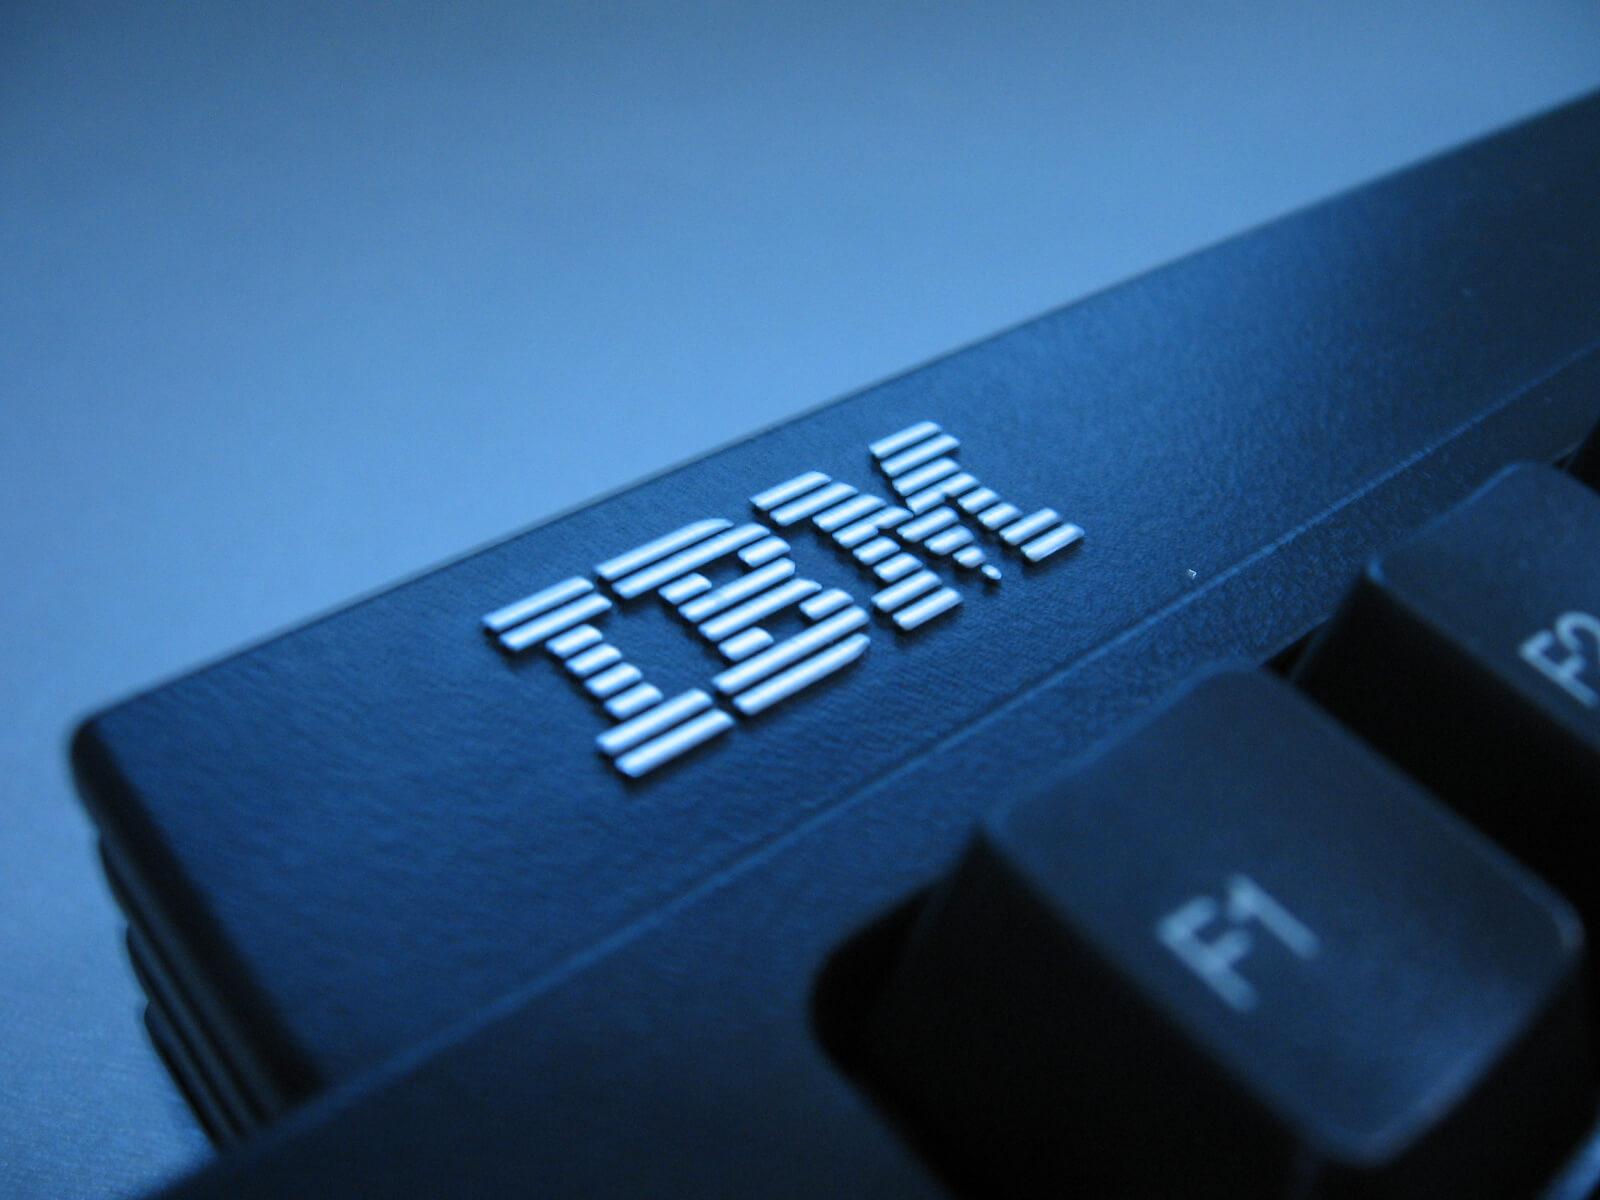 IBM announces 'high-precision' weather model, new quantum computer